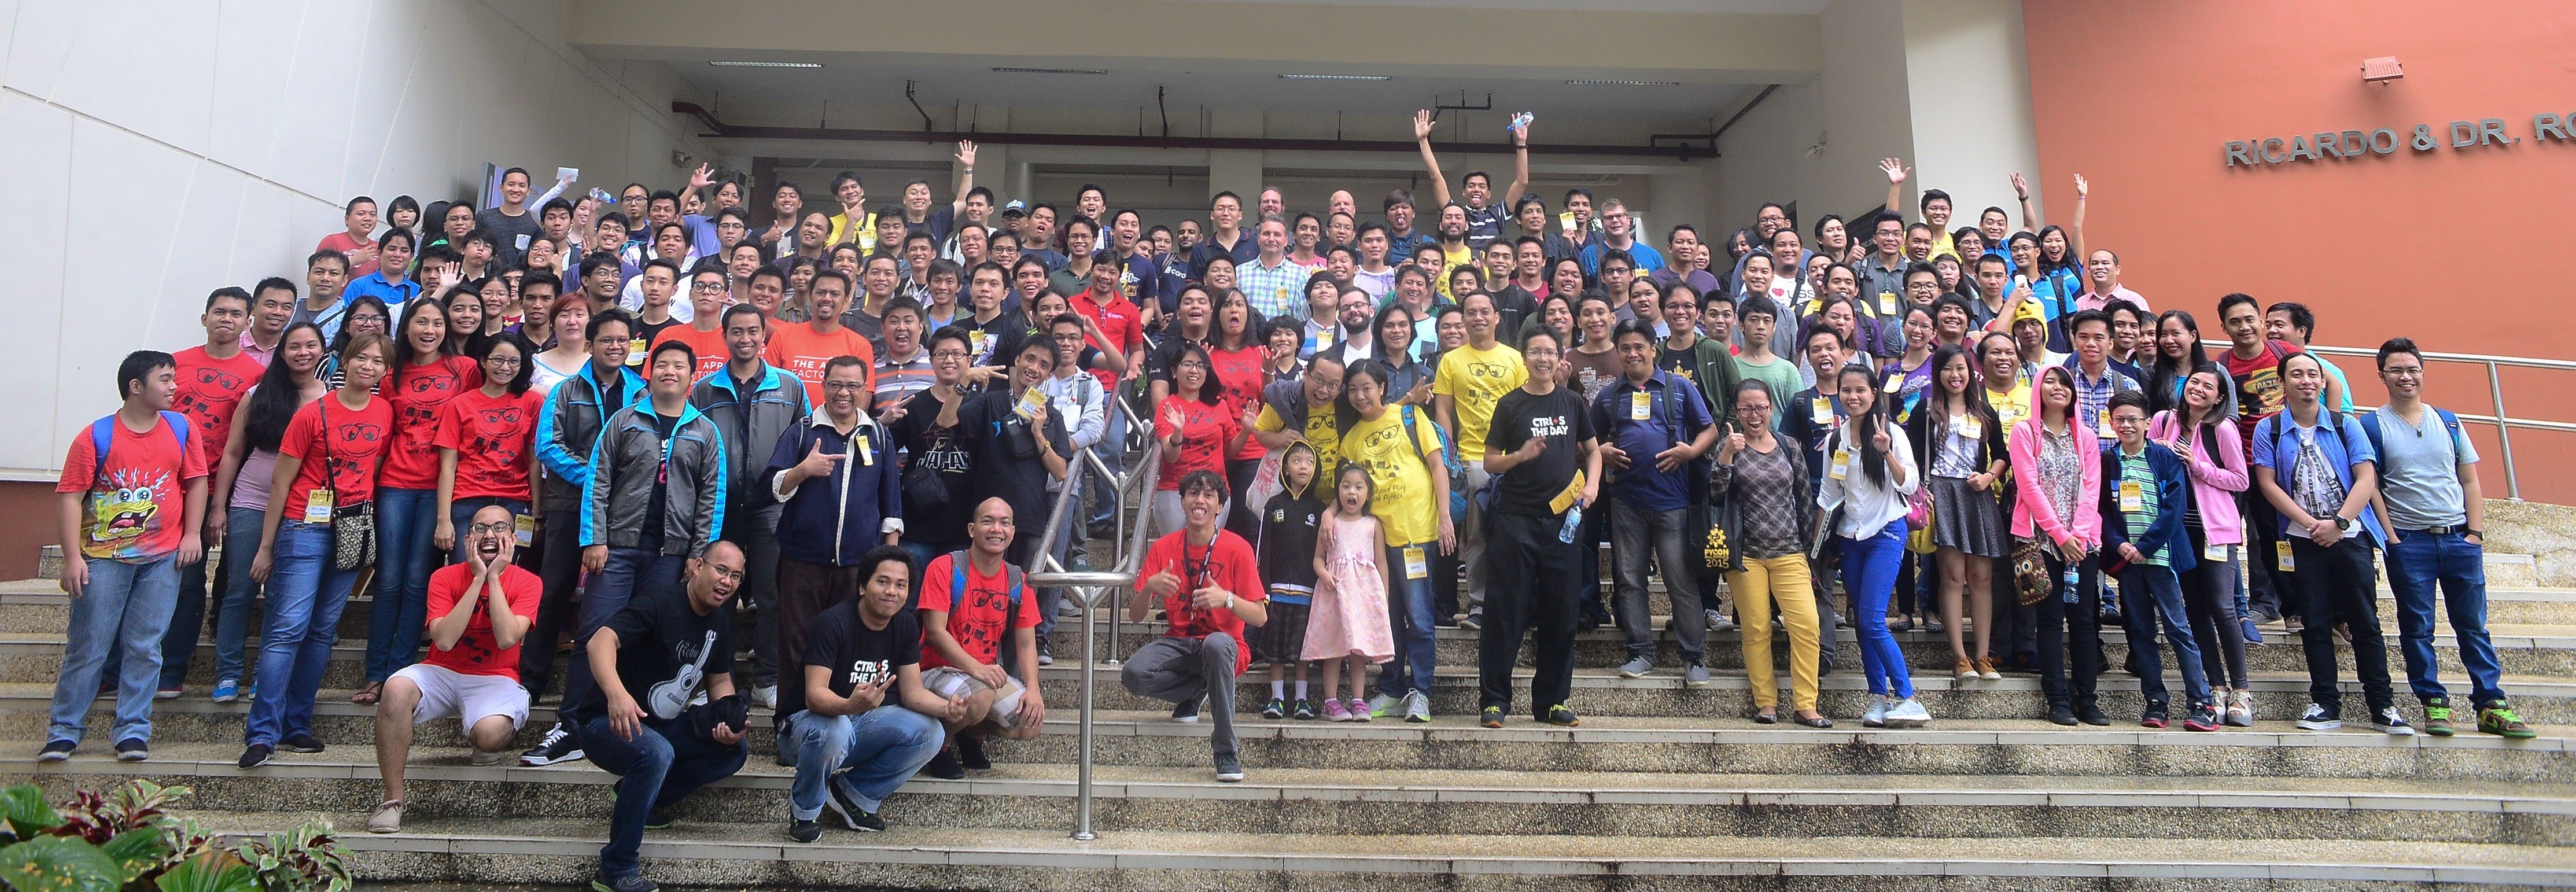 PyCon PH 2015 in Ateneo de Manila University